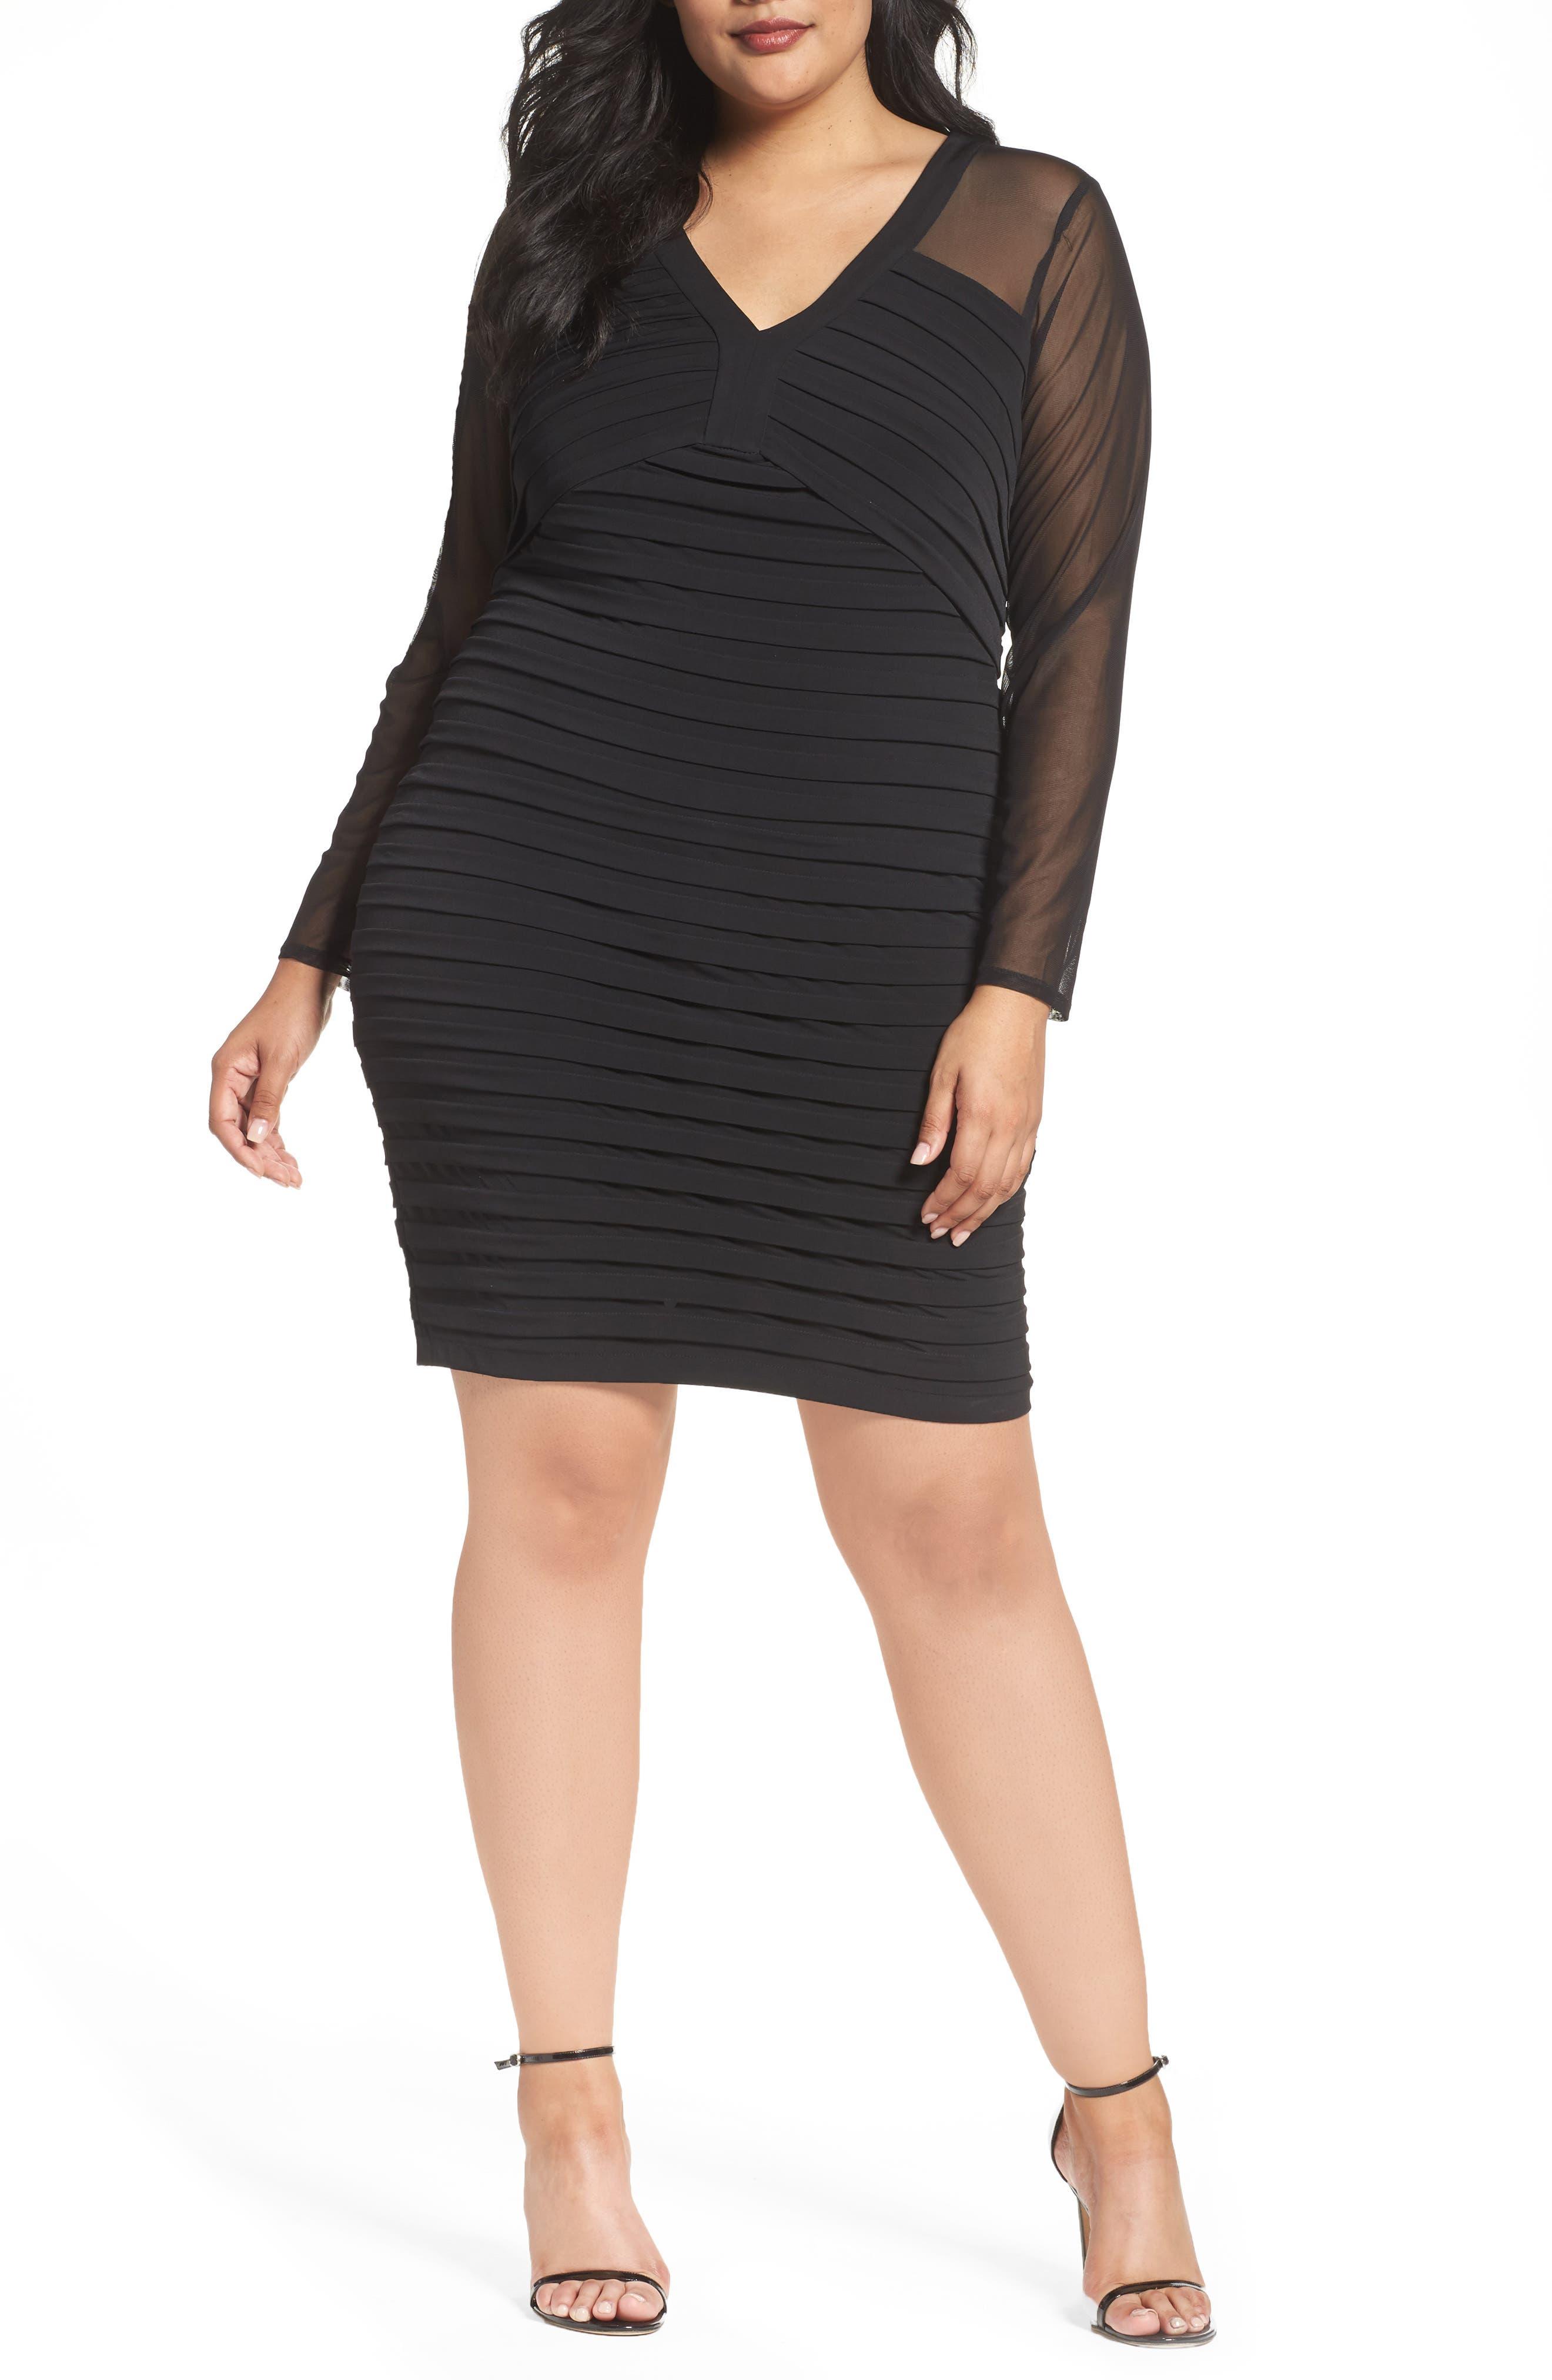 Alternate Image 1 Selected - London Times Shutter Pleat Jersey Skeath Dress (Plus Size)